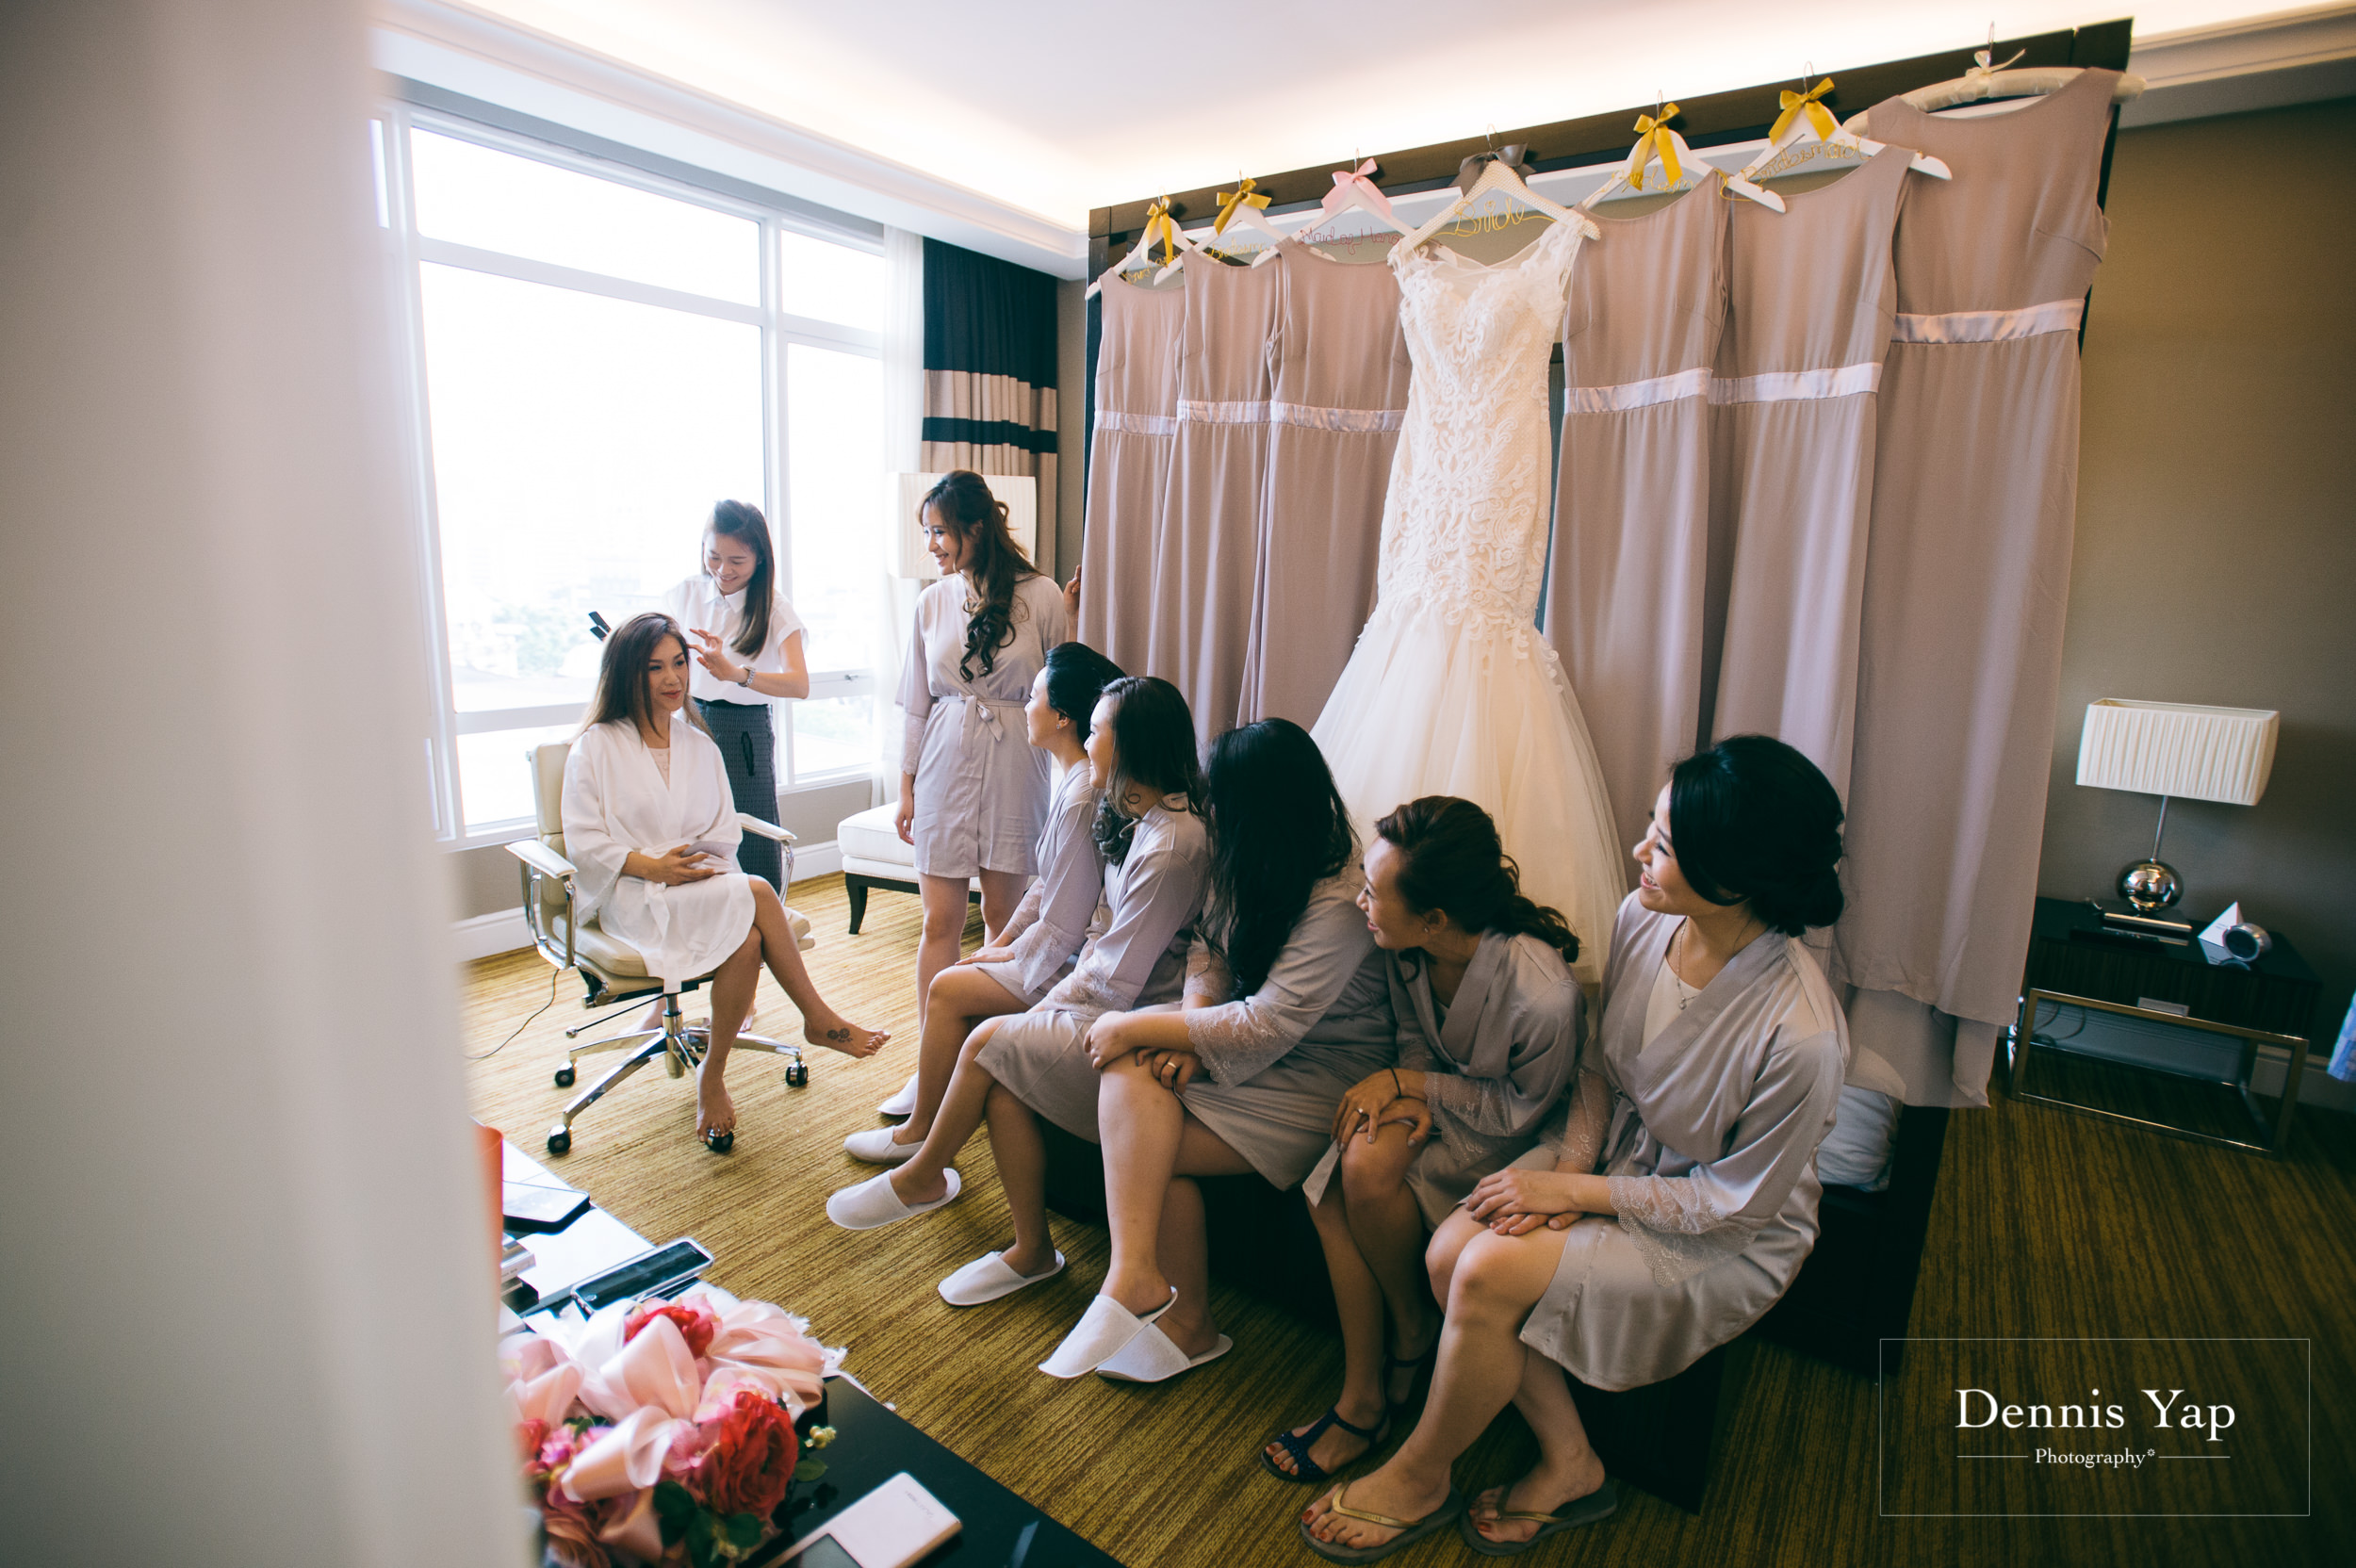 lionel joanne garden wedding majestic hotel dennis yap photography malaysia top wedding photographer-5.jpg